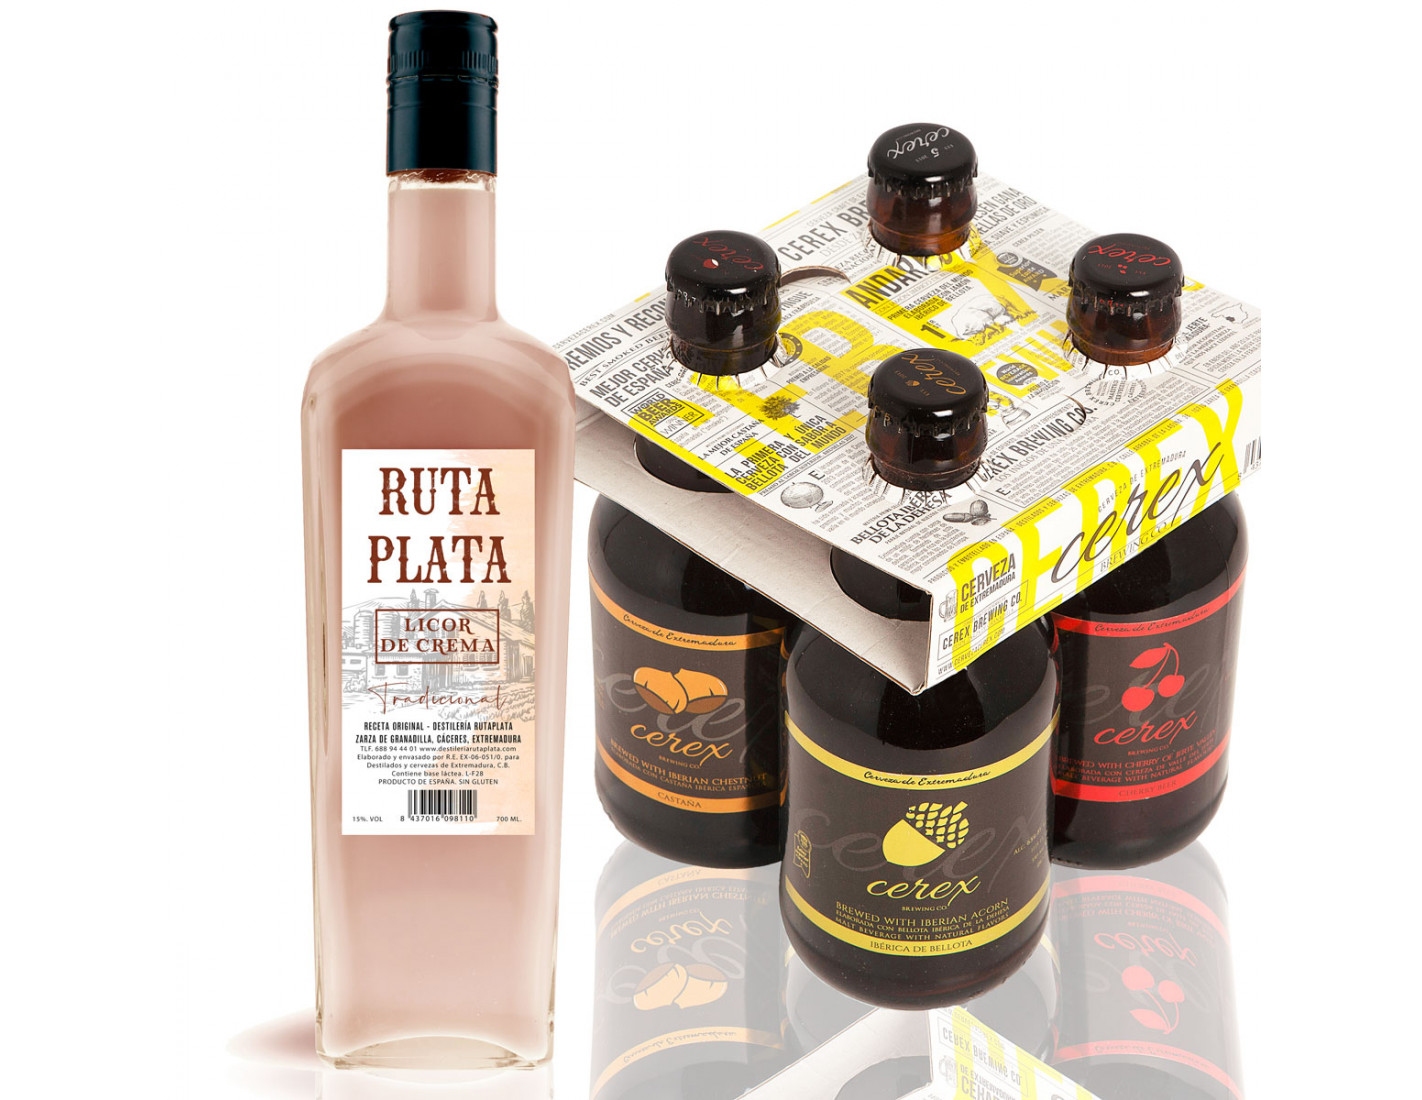 Pack 4 cervezas artesanales Cerex 33 cl + Crema de Orujo RutaPlata 700 ml